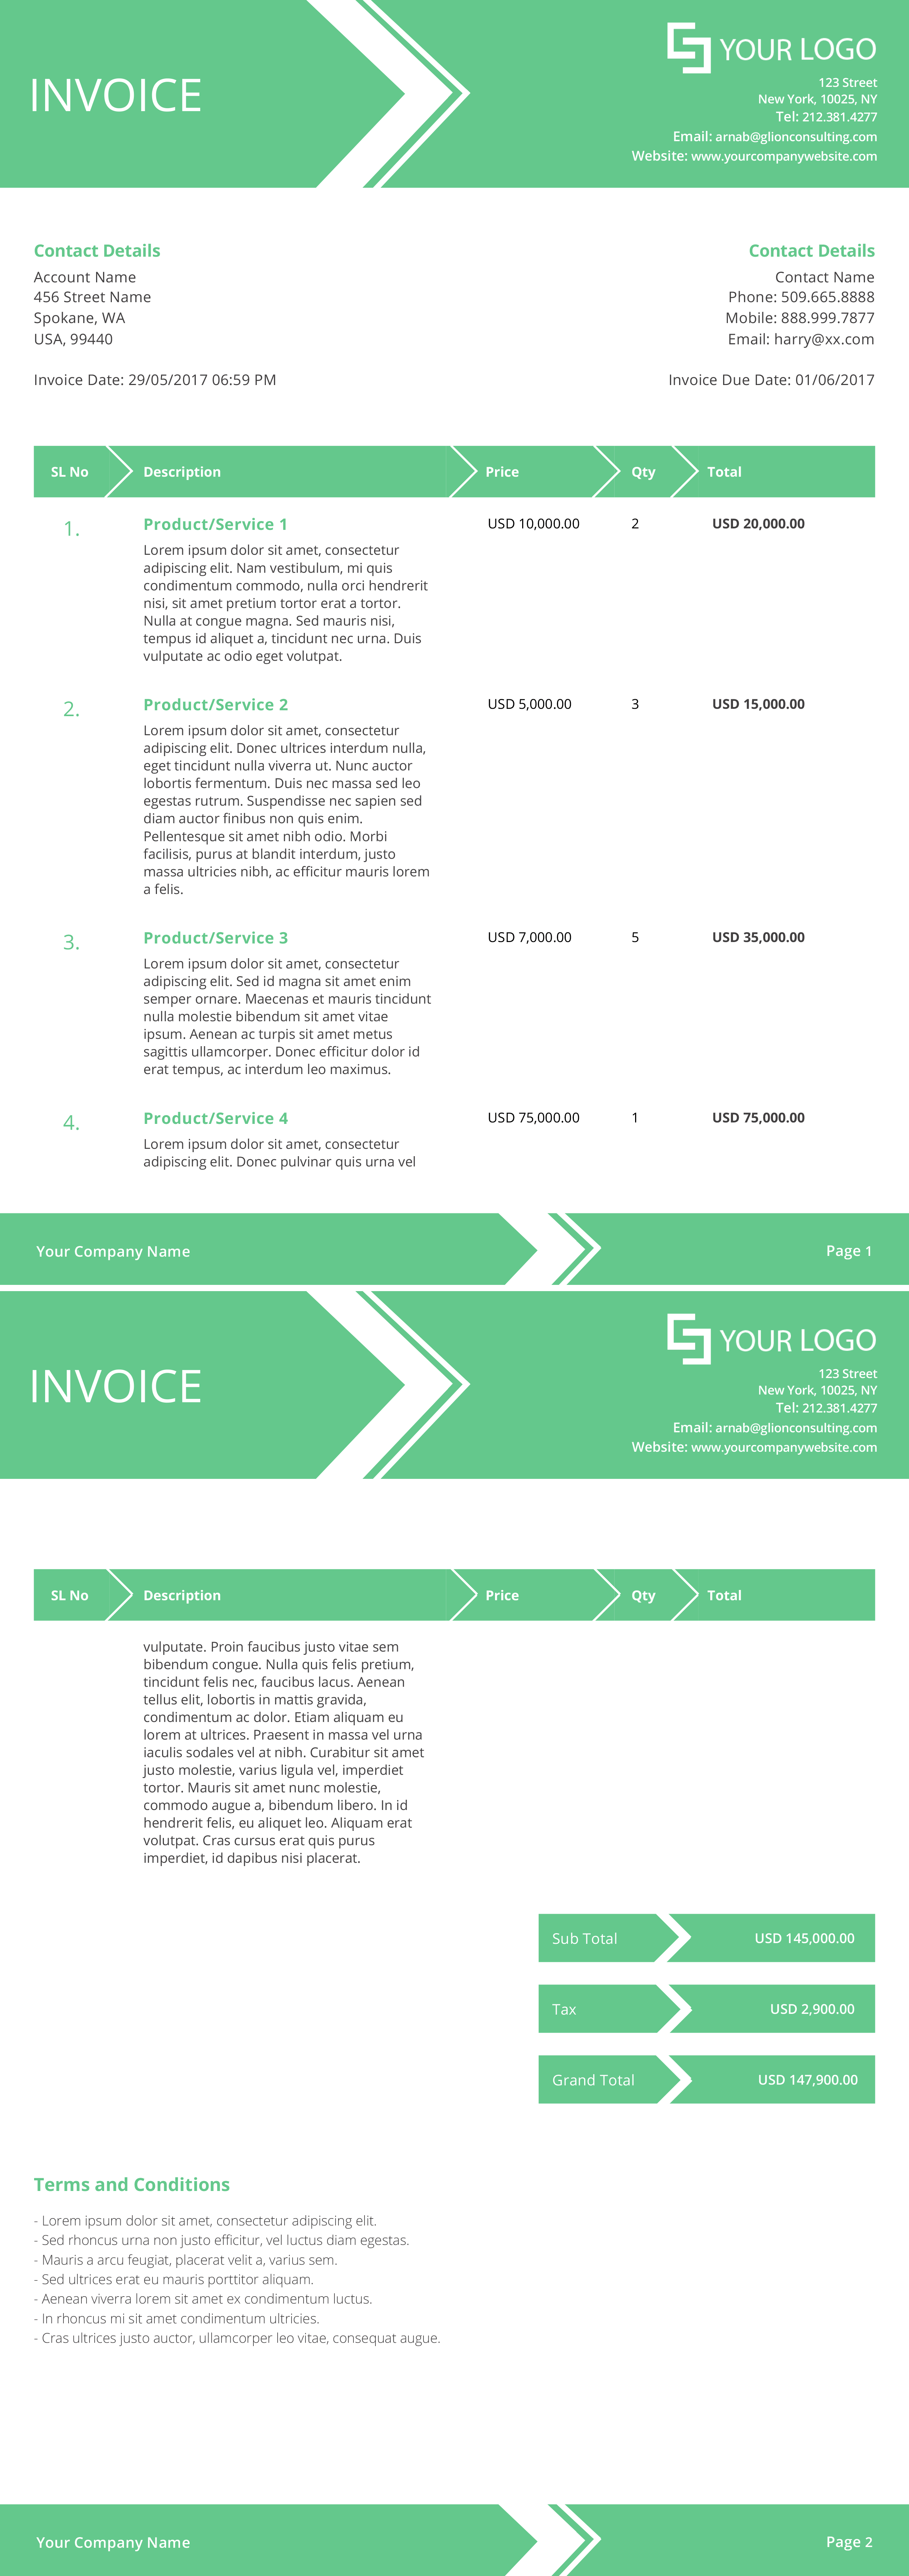 INV-DEER-GREEN-64C88C-4.png